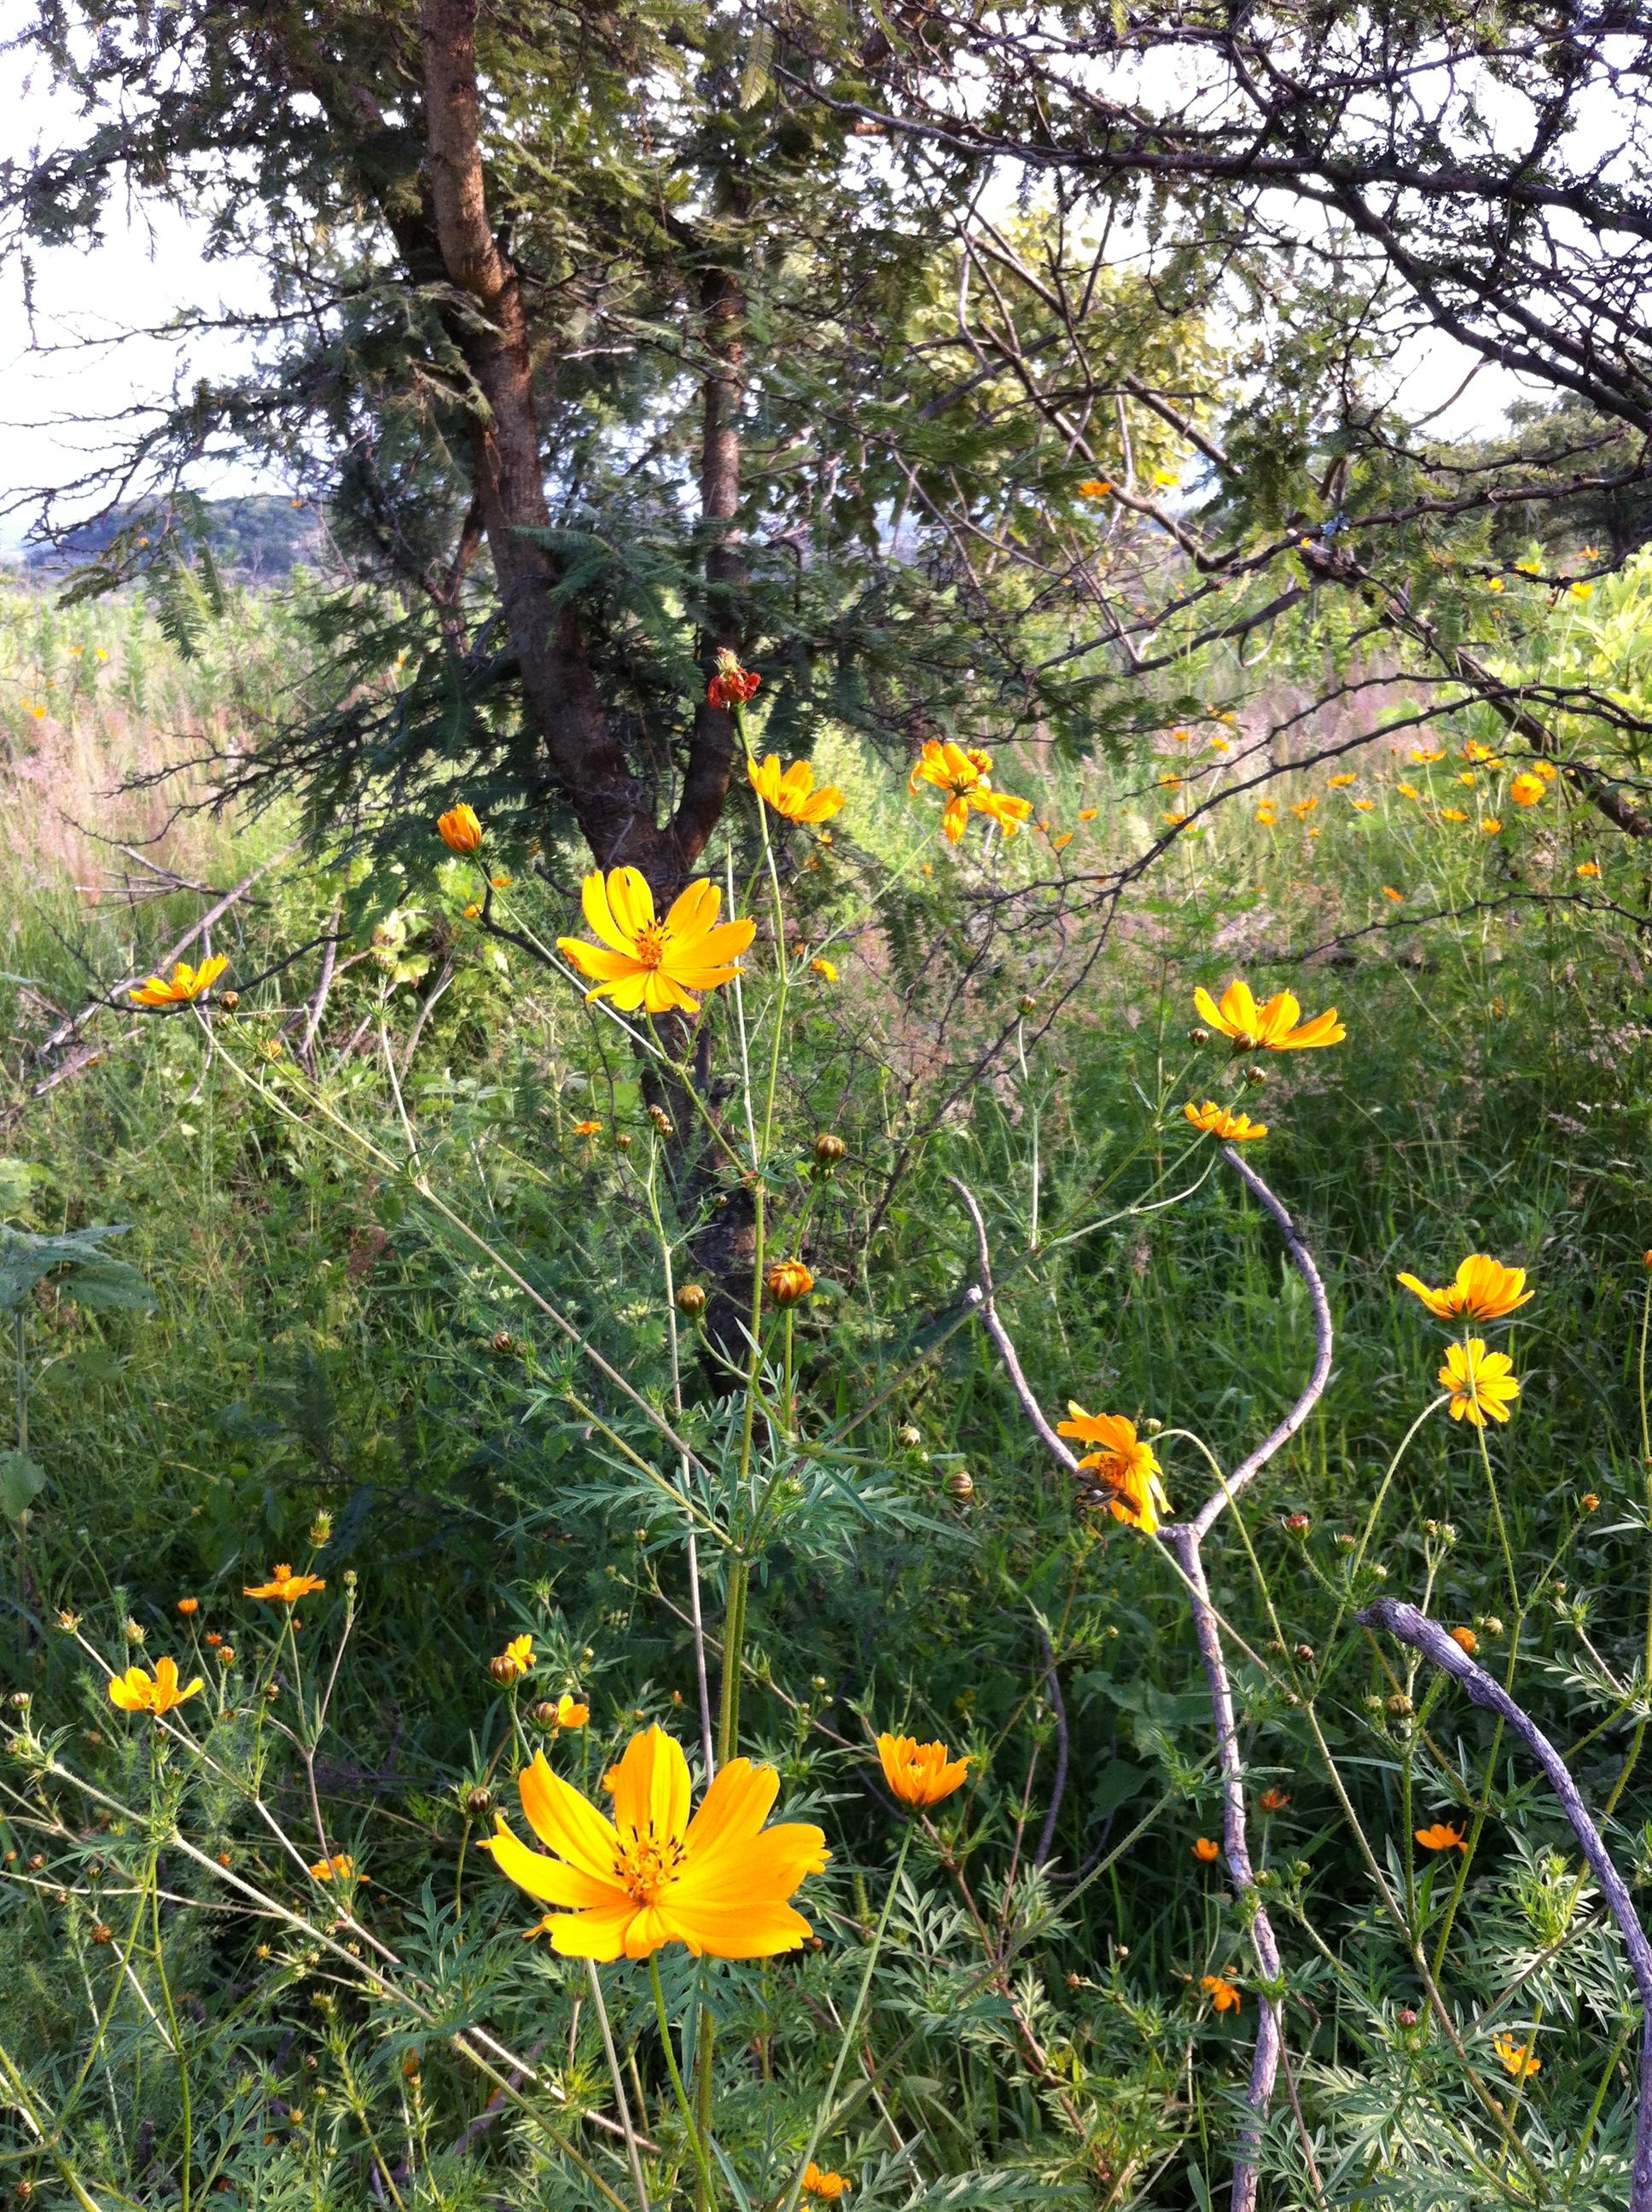 Brené Brown on Boundaries & Compassion